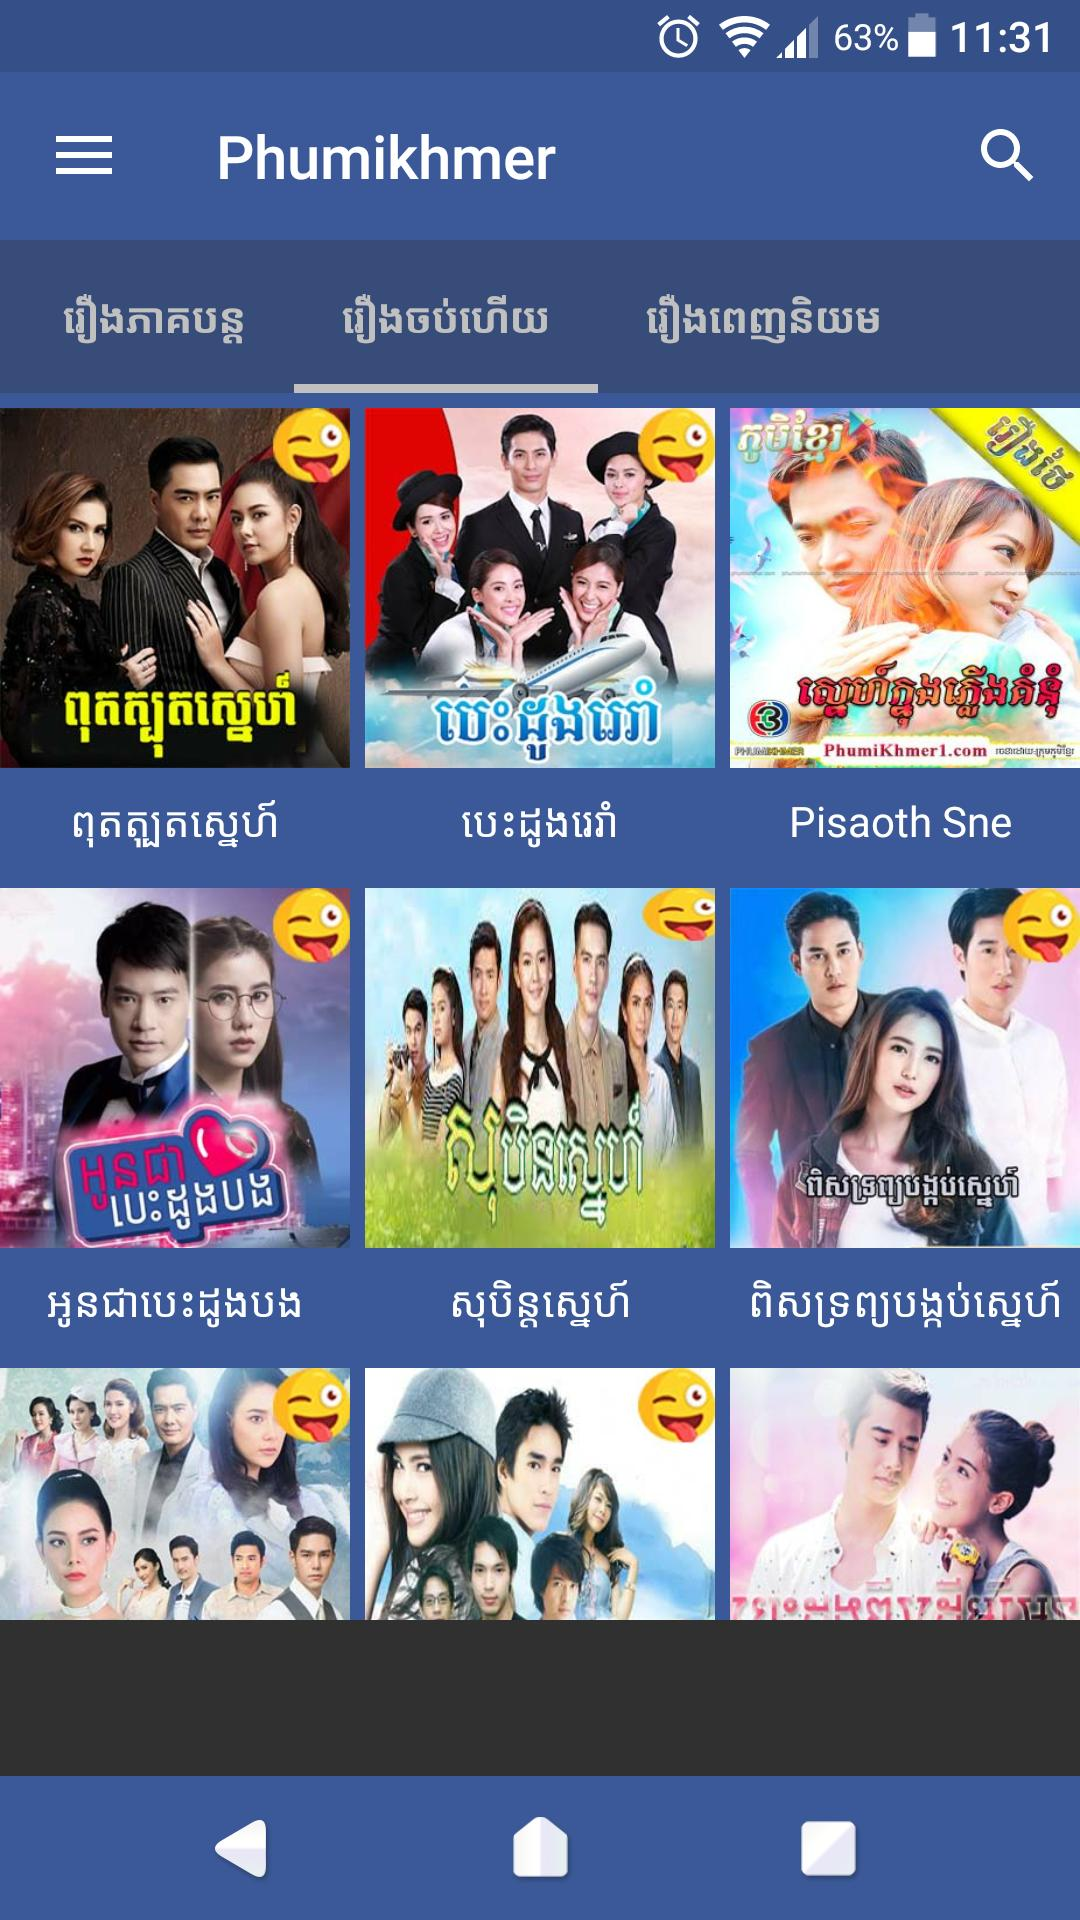 PhumiKhmer(ភូមិខ្មែរ) - Best Thai Drama Movies for